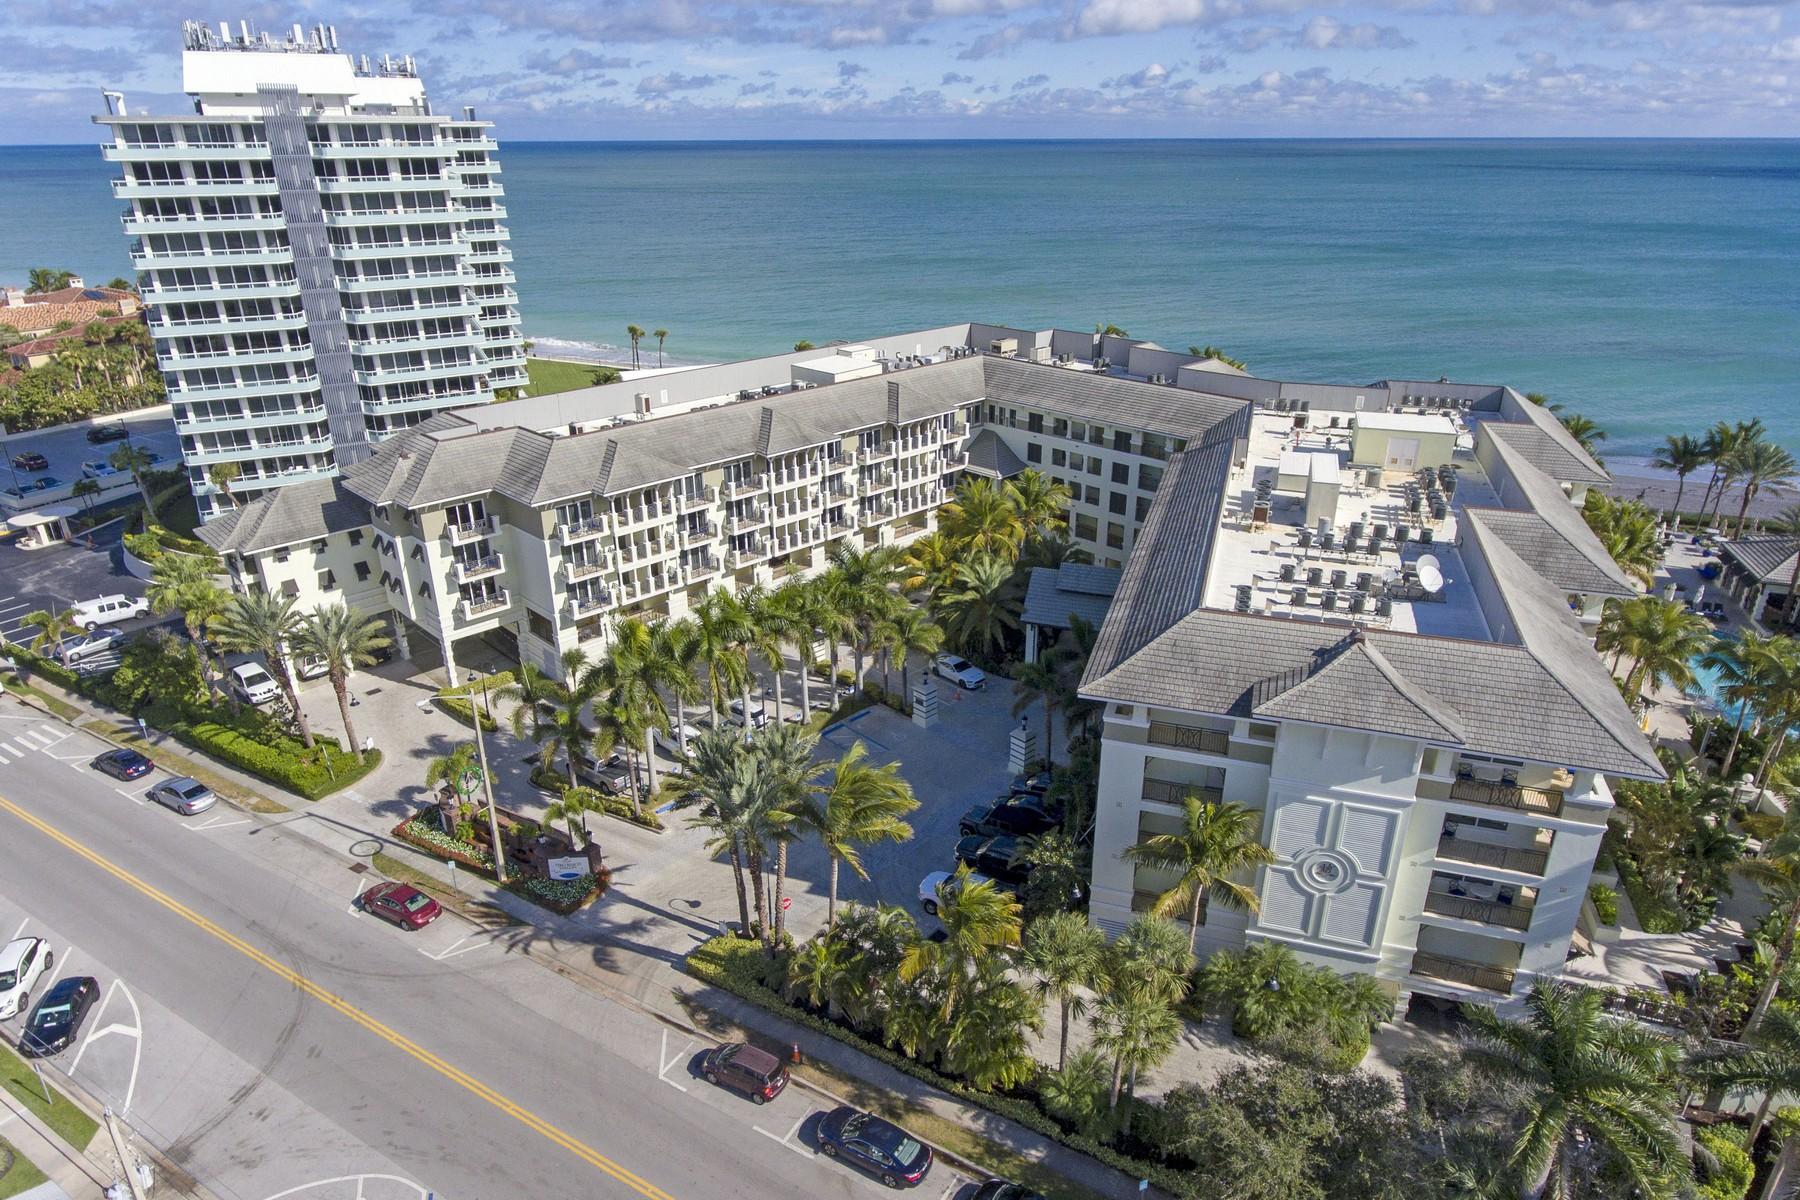 Property for Sale at Vero Beach Hotel & Club Kimpton 3500 Ocean Drive #430 Vero Beach, Florida 32963 United States